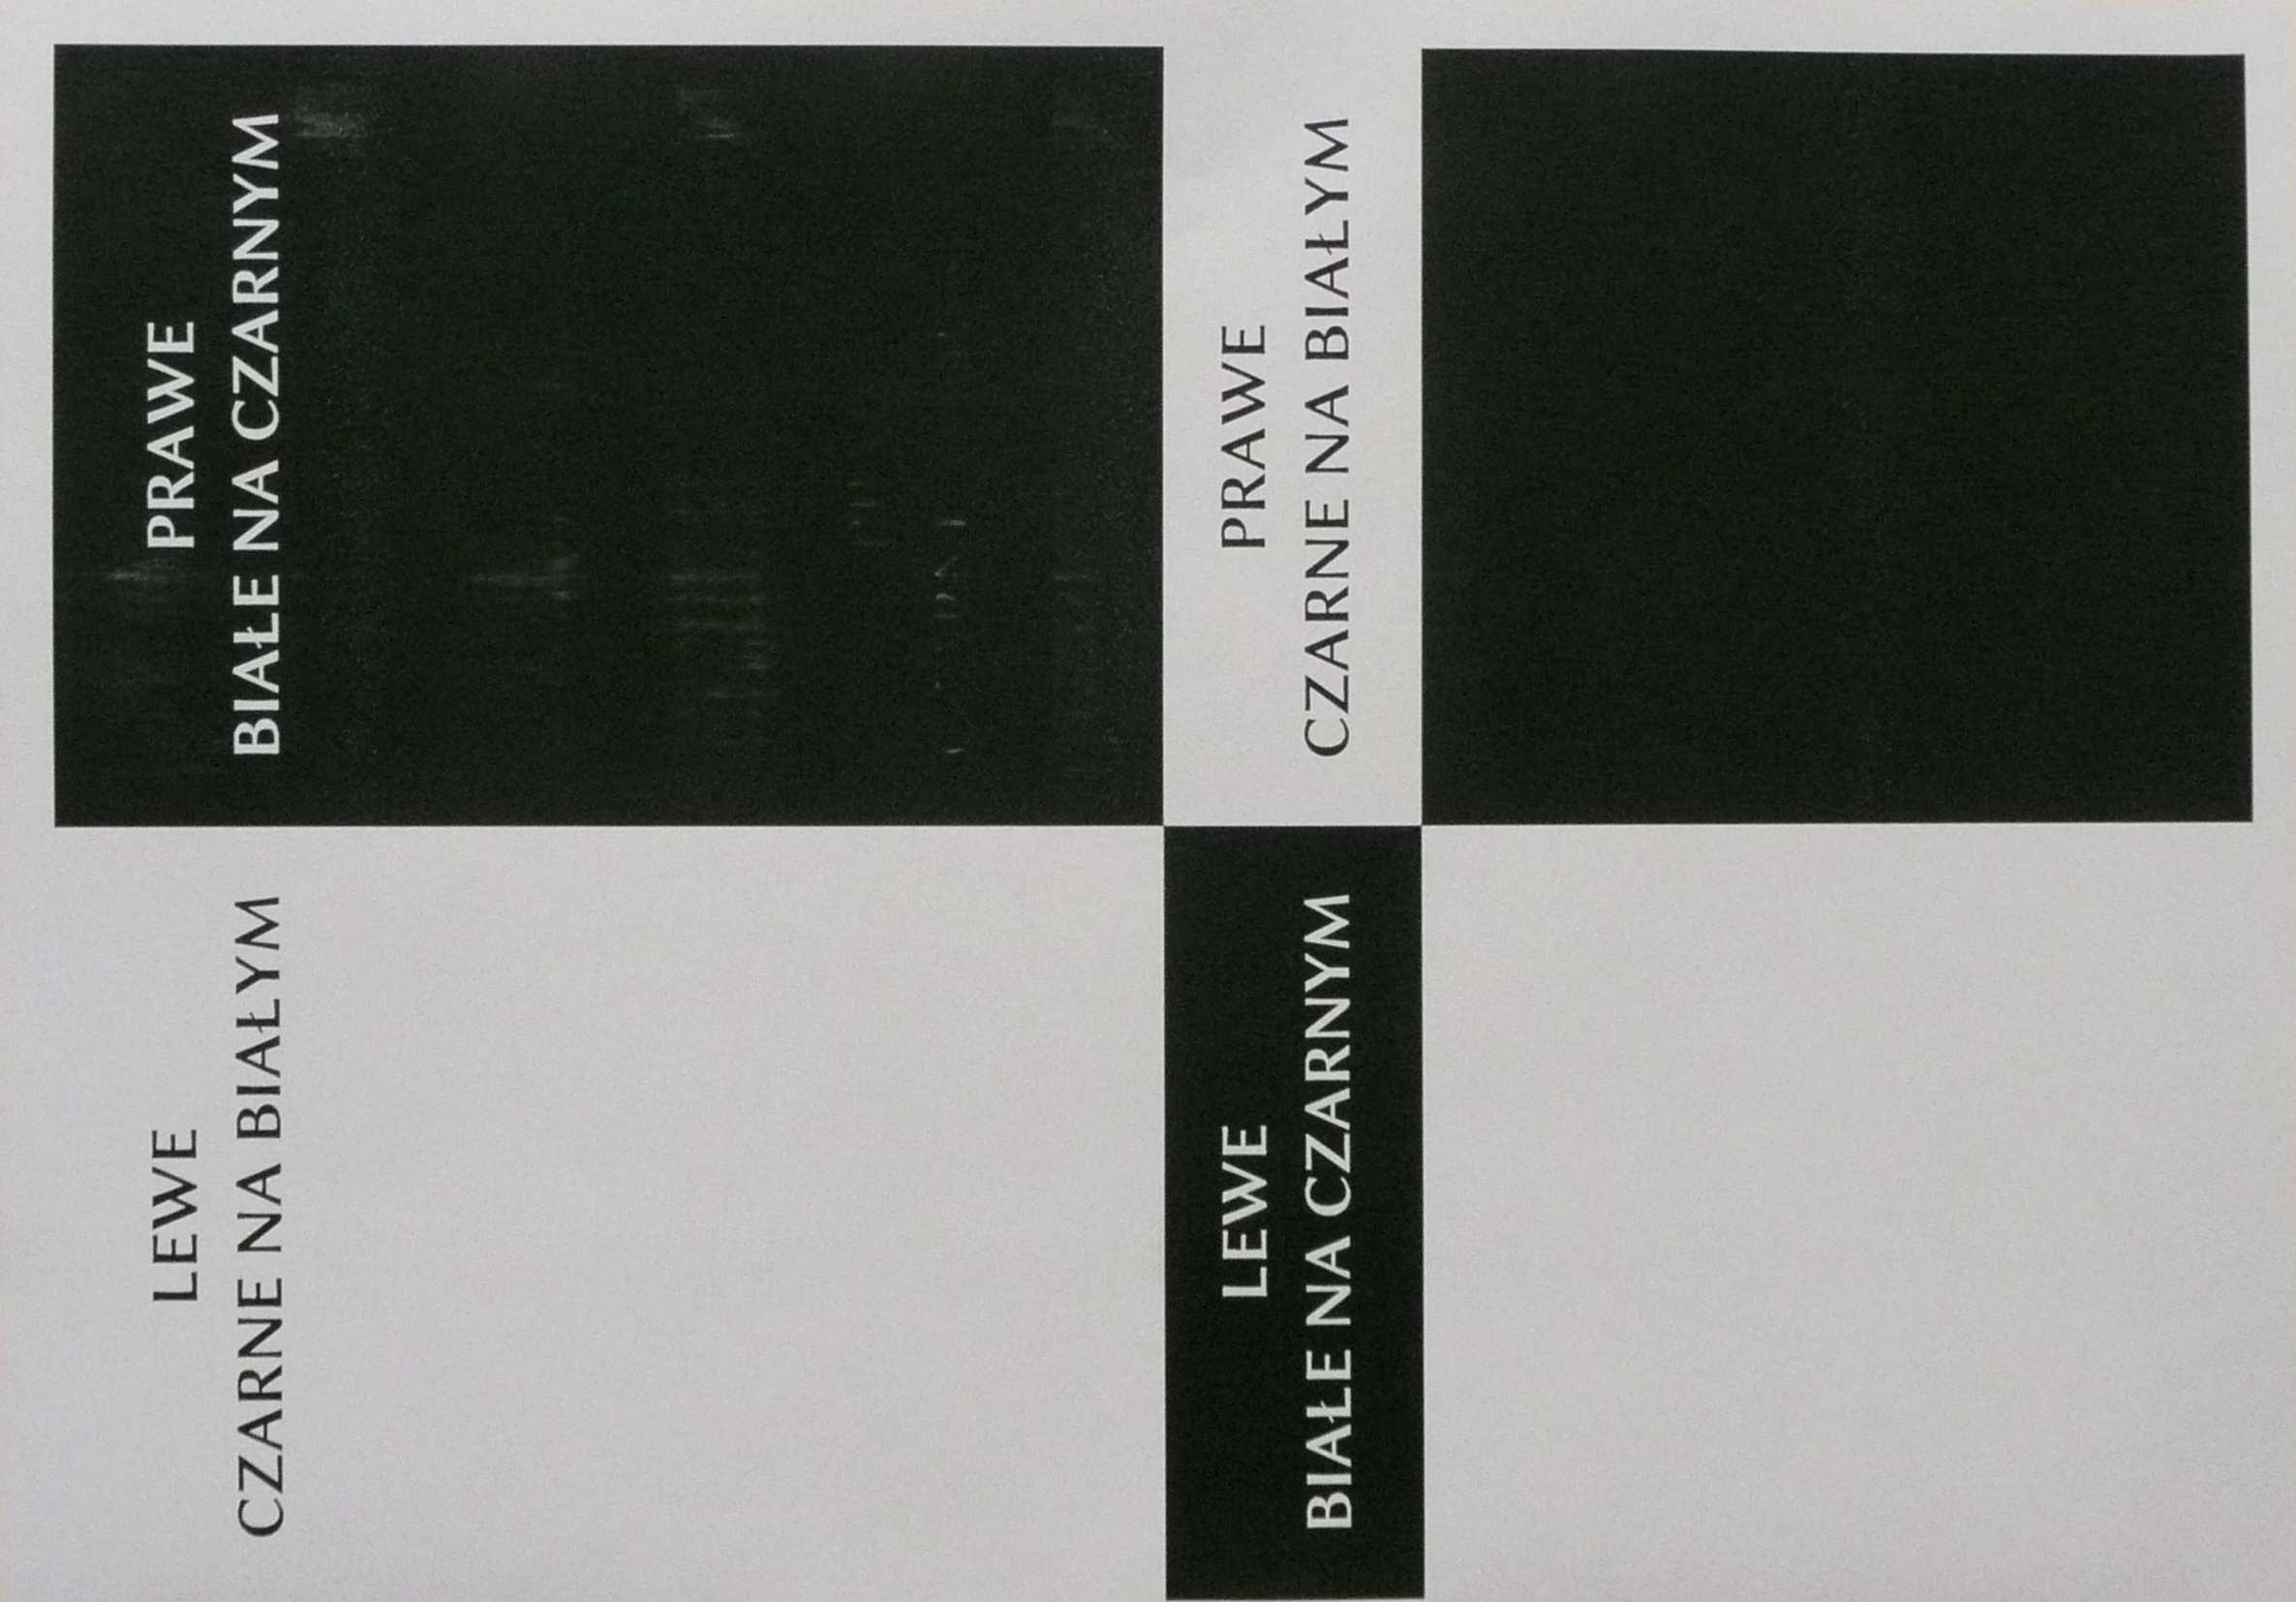 Lexmark E-232 ciemne smugi na wydrukach